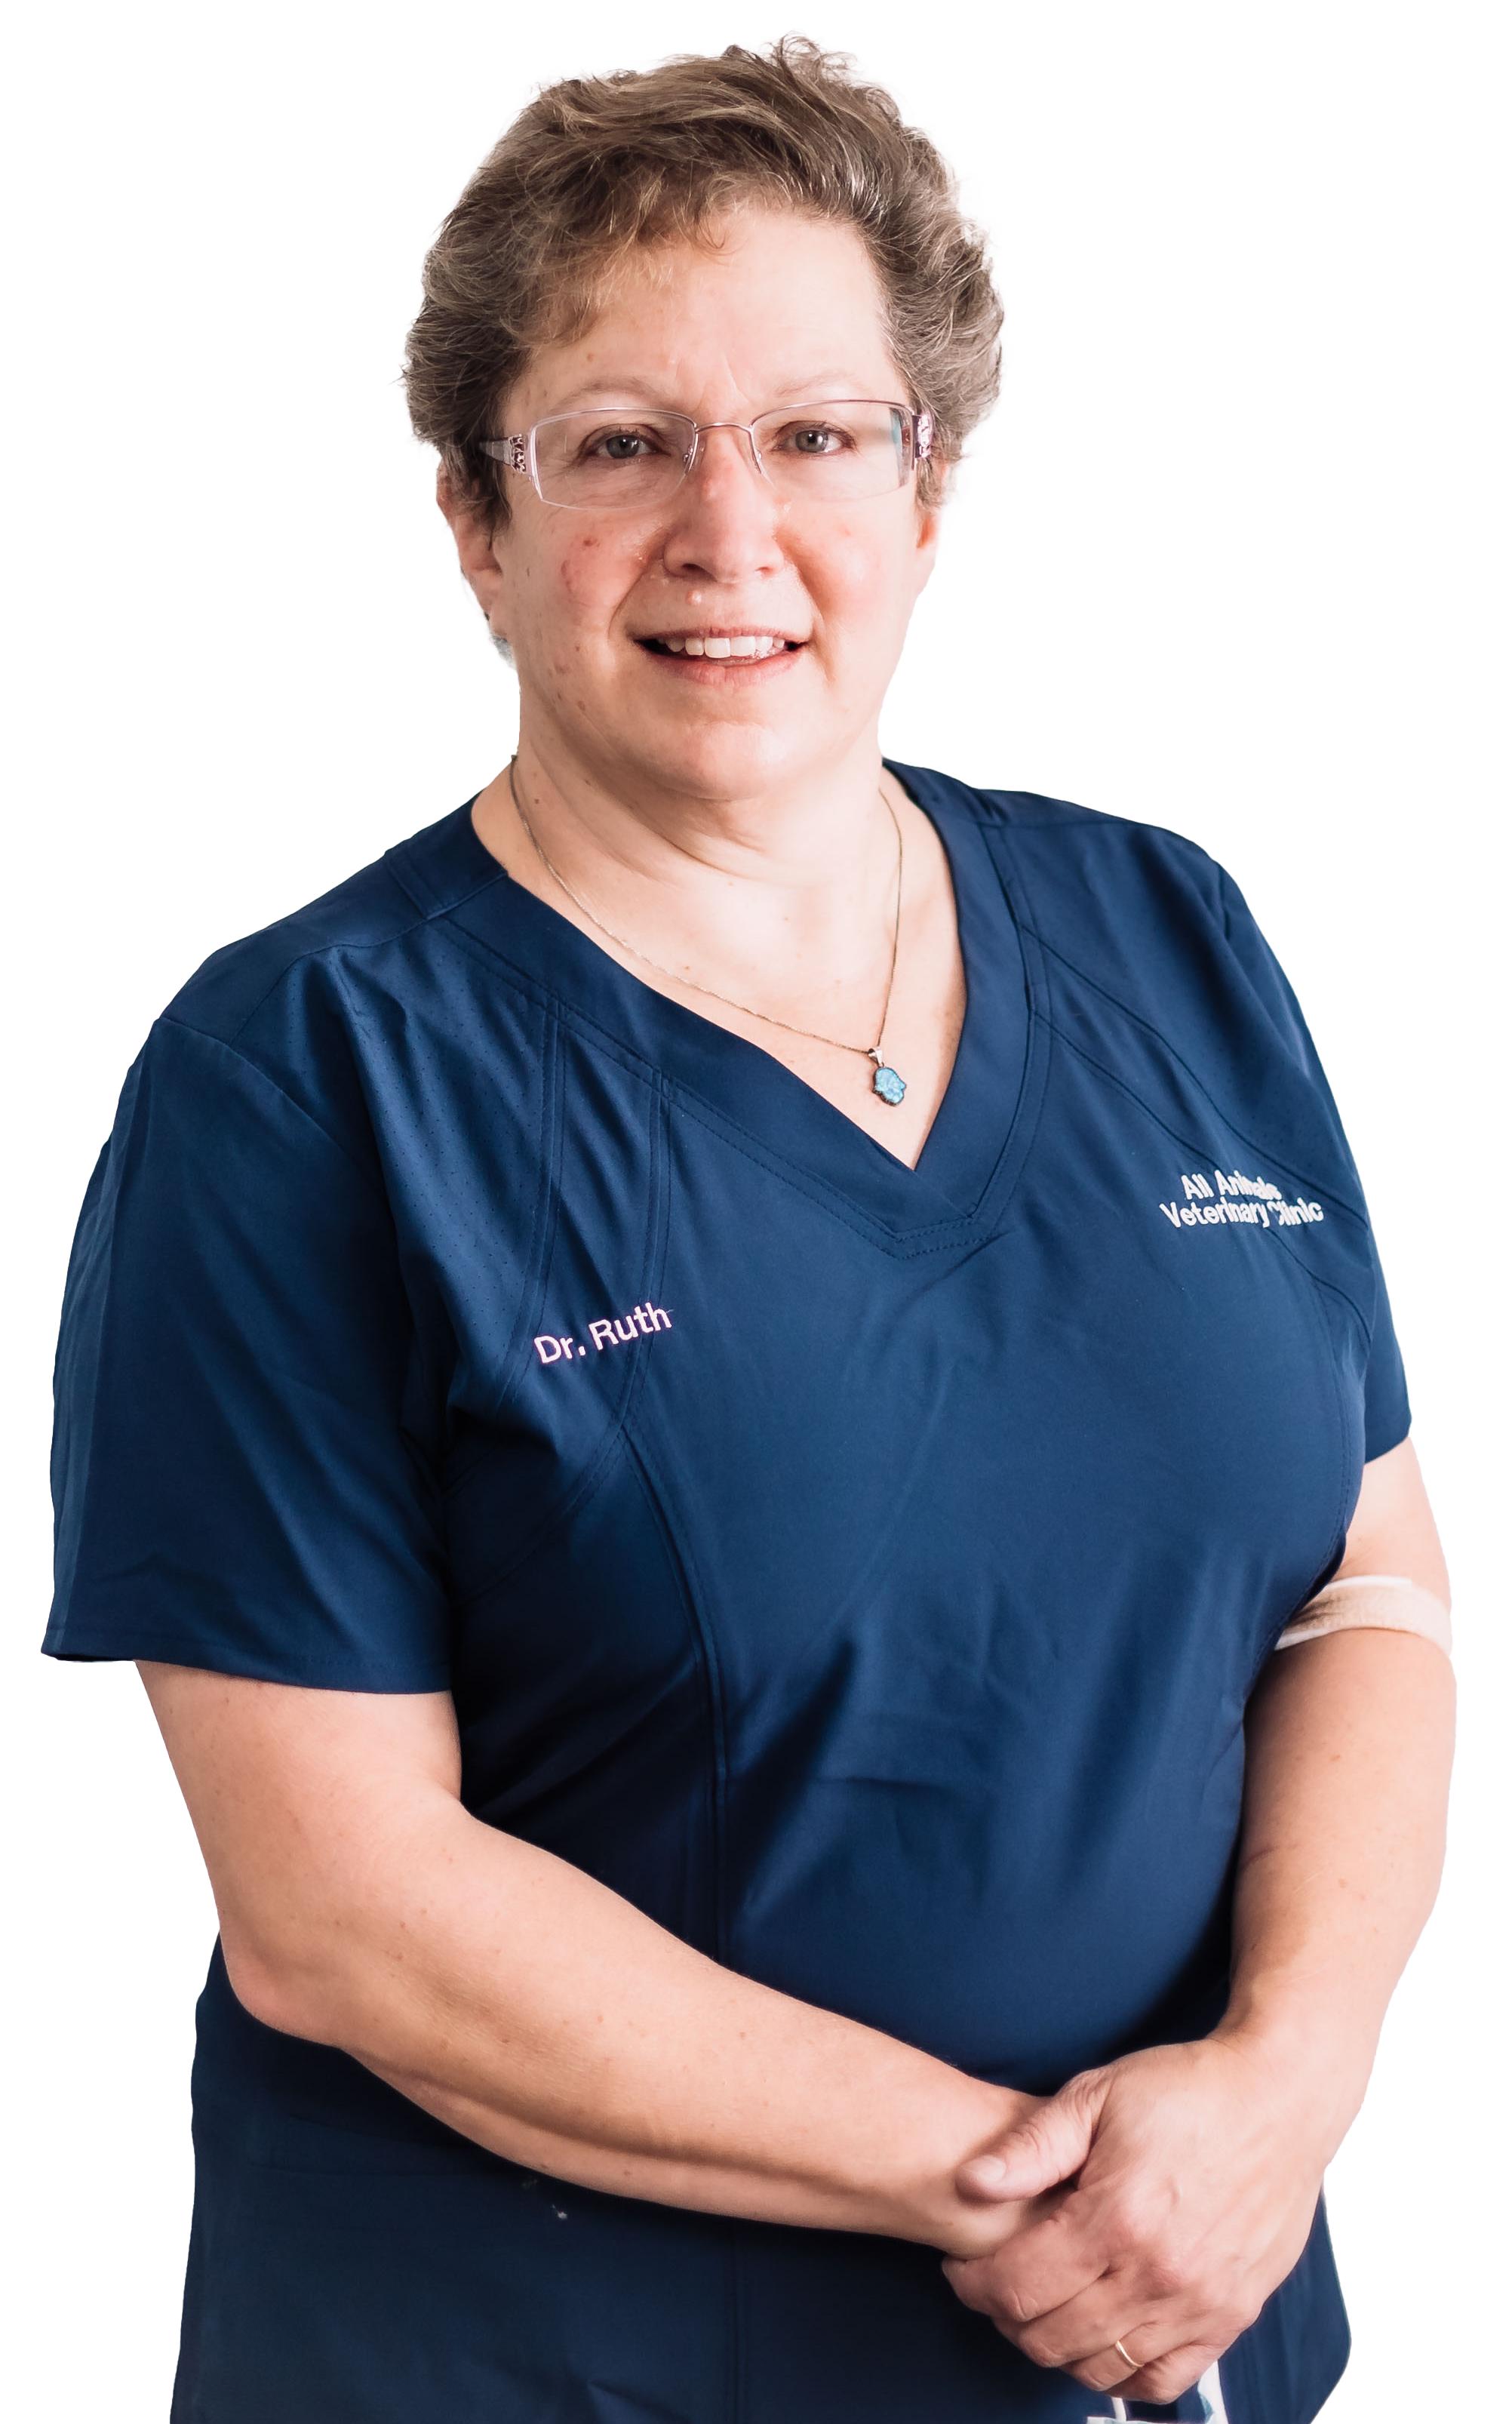 Dr. Ruth Landau